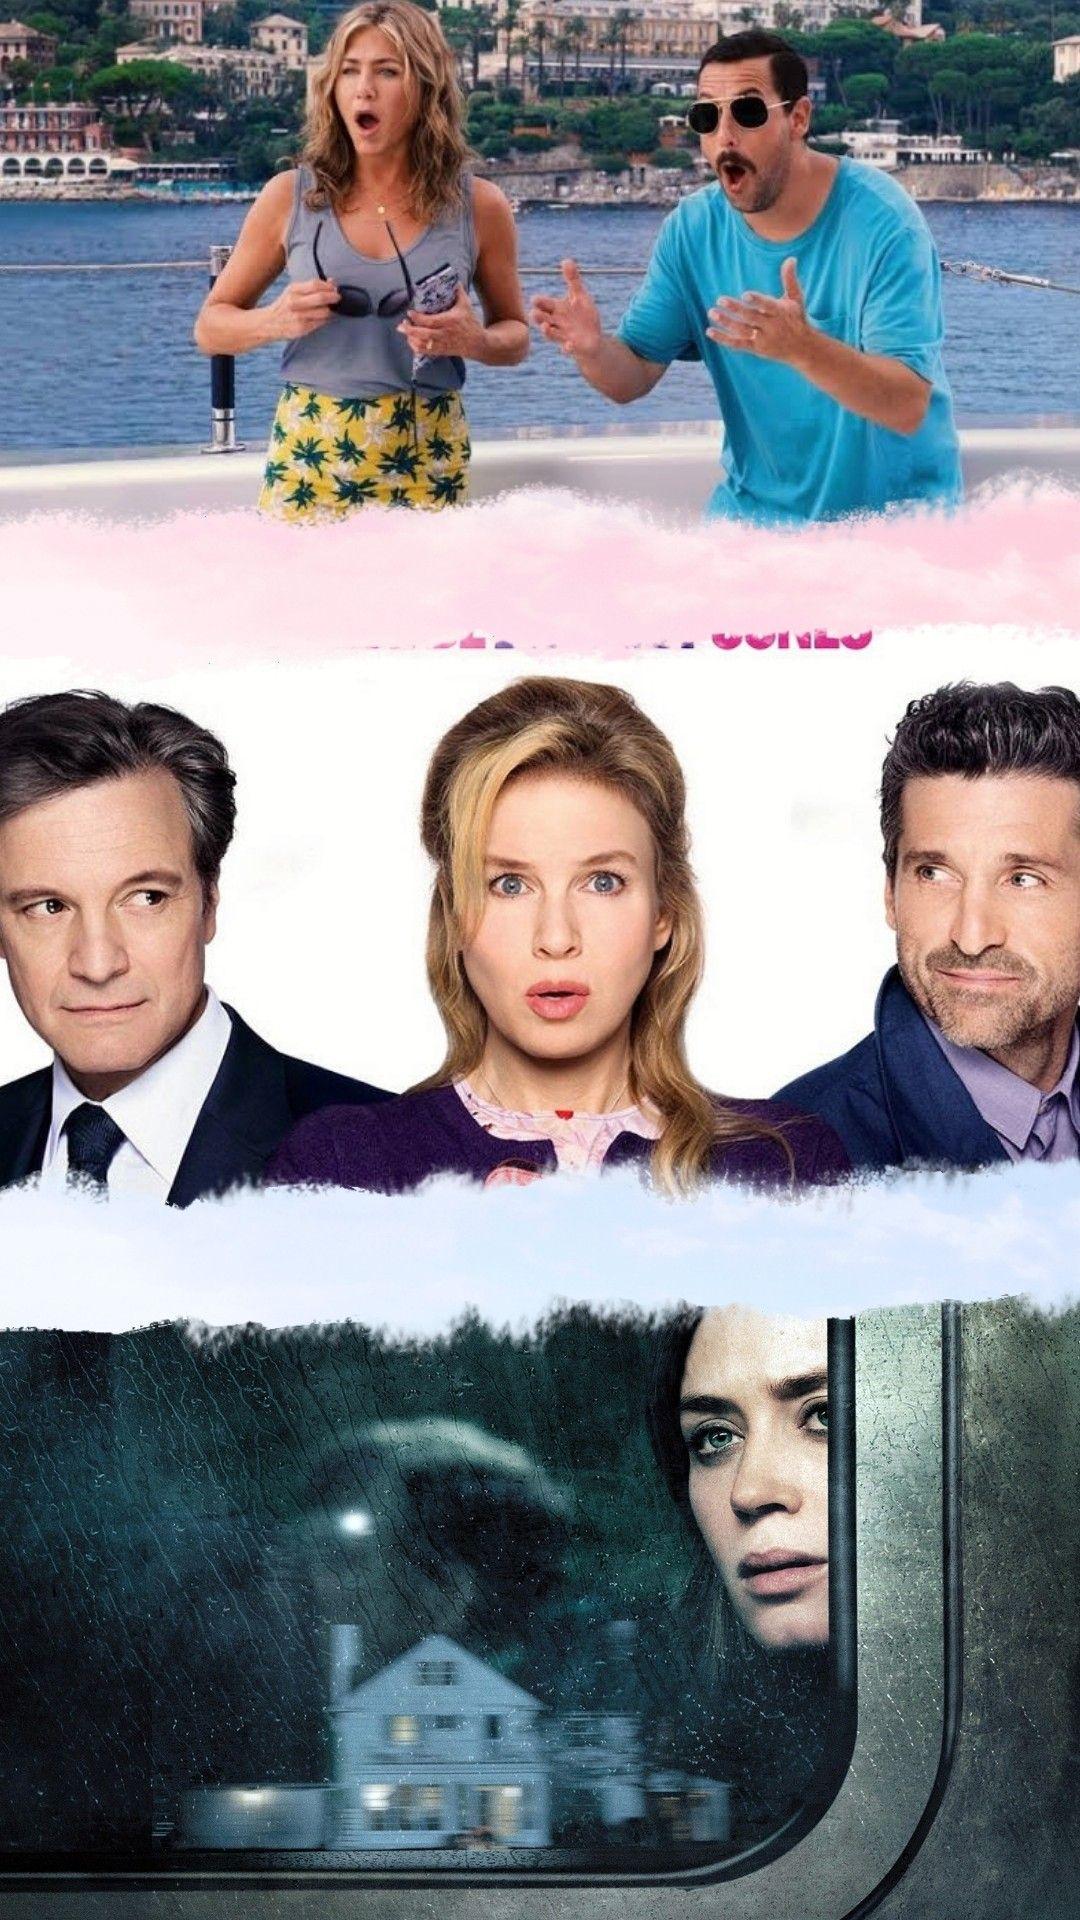 Últimos filmes assistidos na Netflix Filmes, Netflix